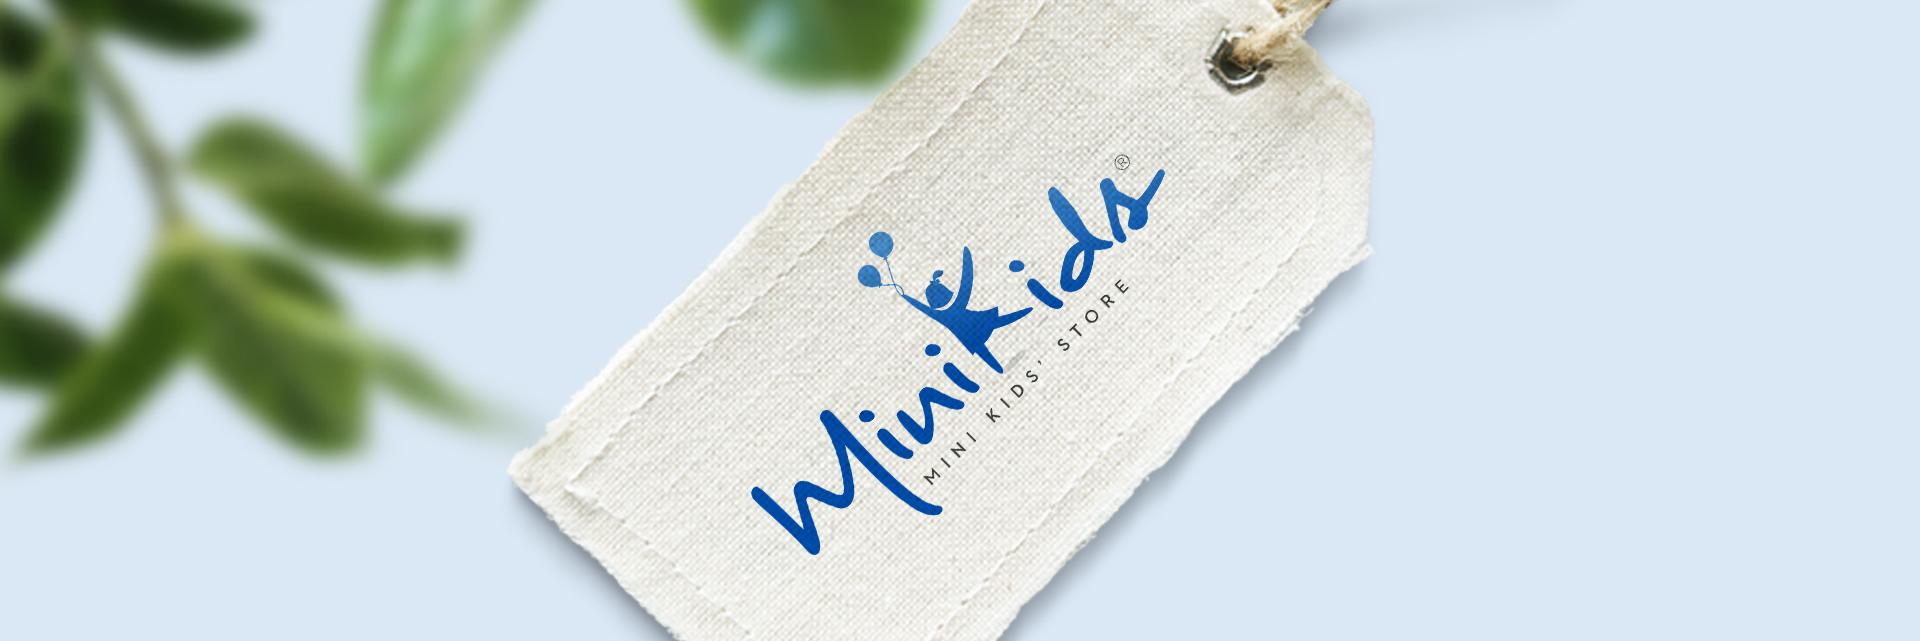 Minikids_thiet_ke_Logo_chuyen_nghiep_gia_tot_Slide2